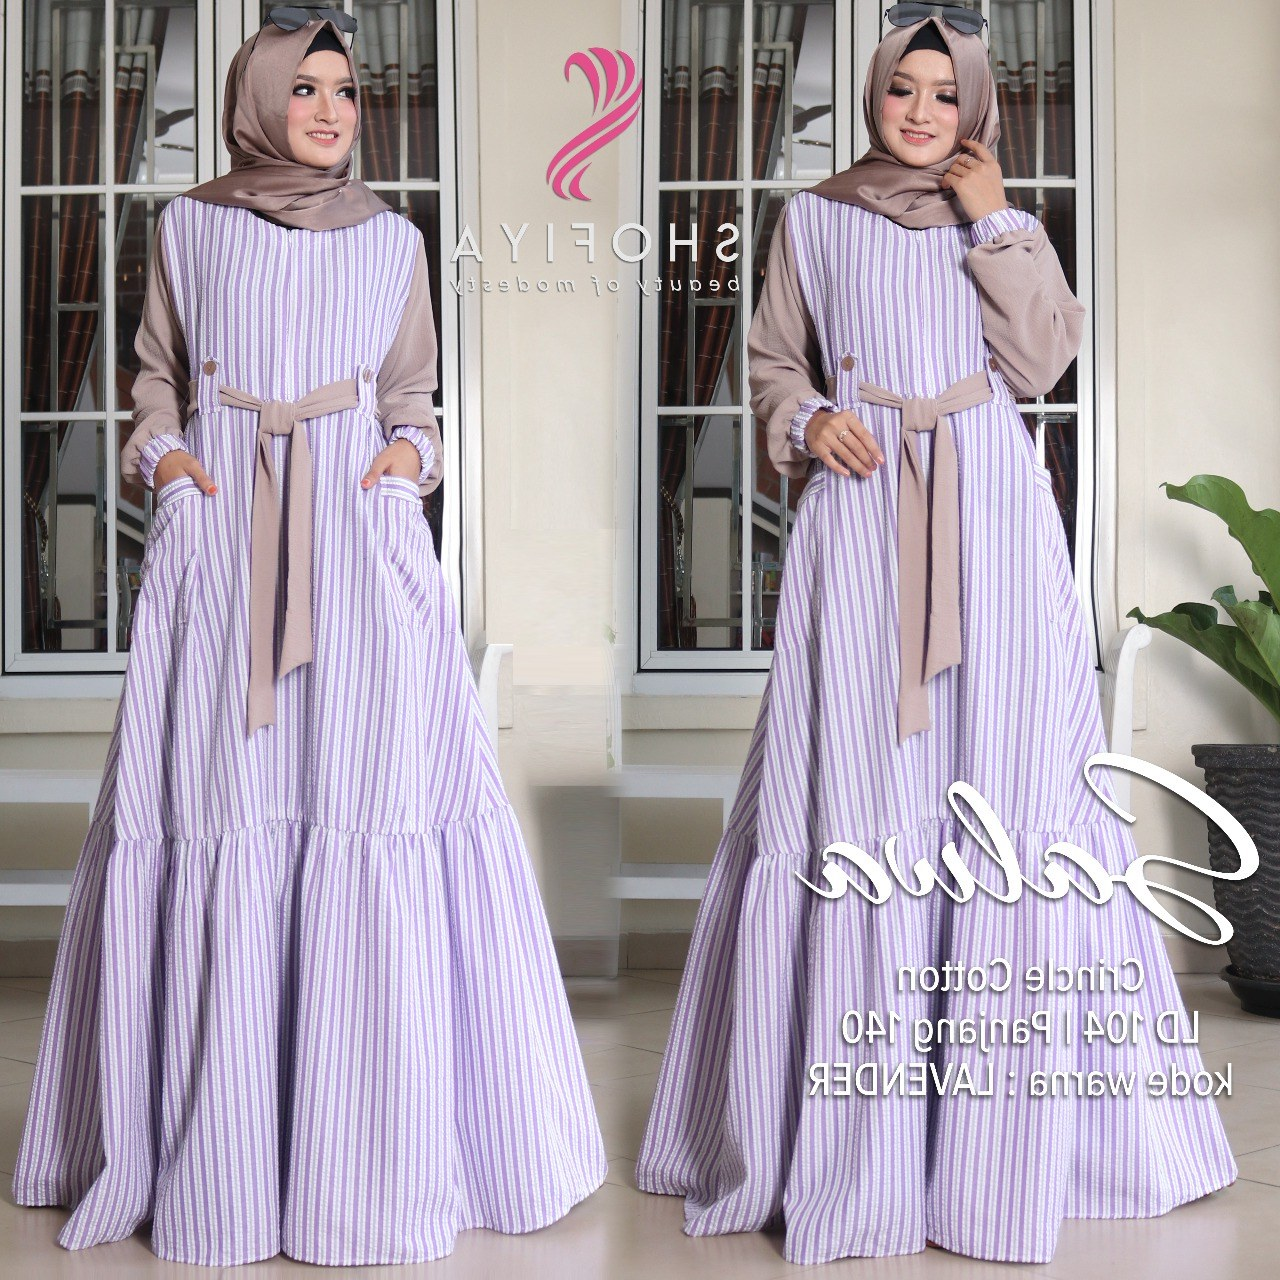 Bentuk Model Baju Lebaran Muslim Terbaru 87dx Model Baju Gamis Terbaru Lebaran Gambar islami